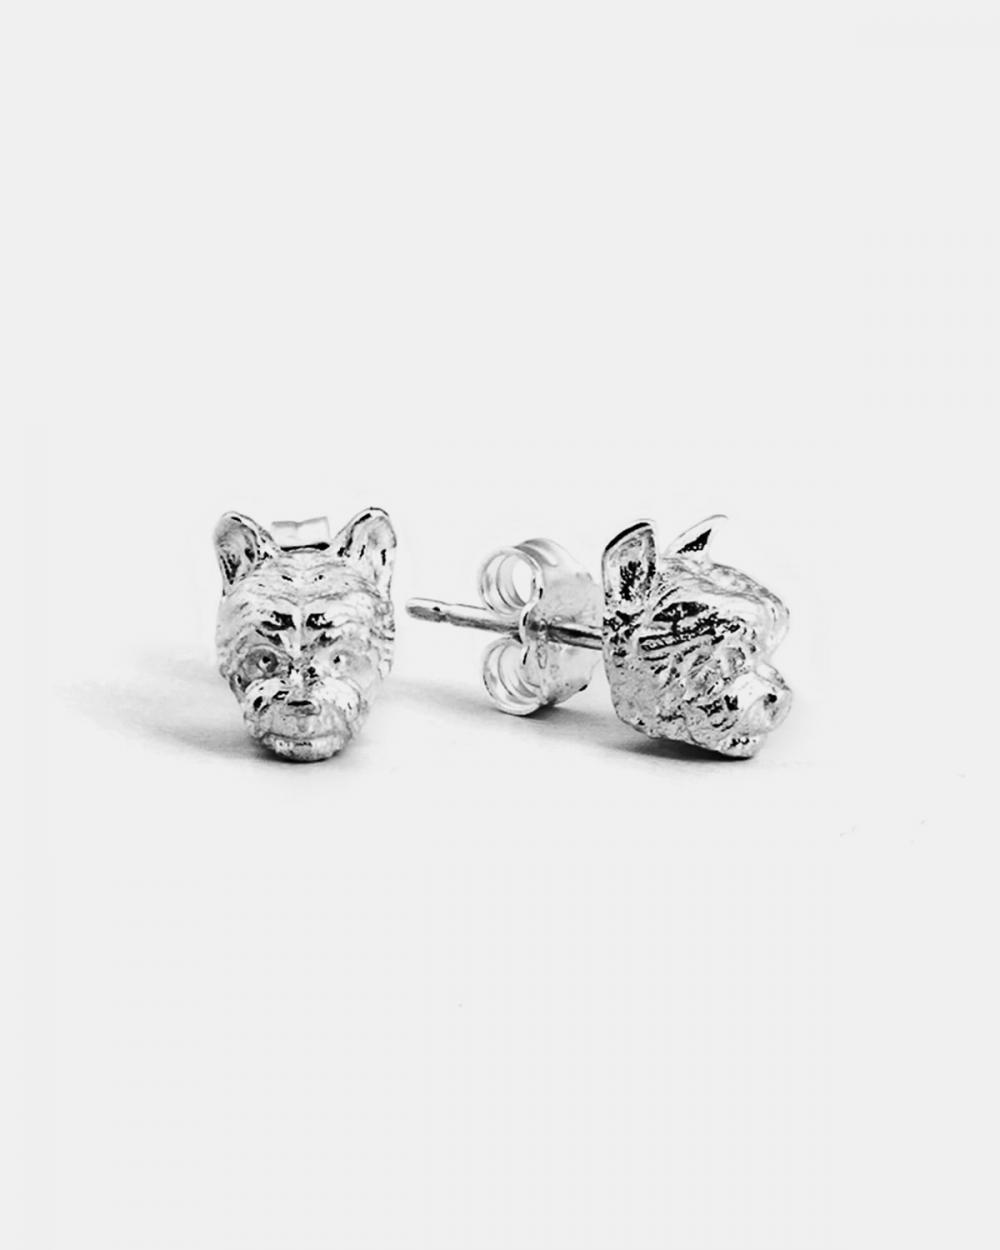 Earrings YORKSHIRE COUPLE EARRINGS / POLISHED SILVER NOVE25